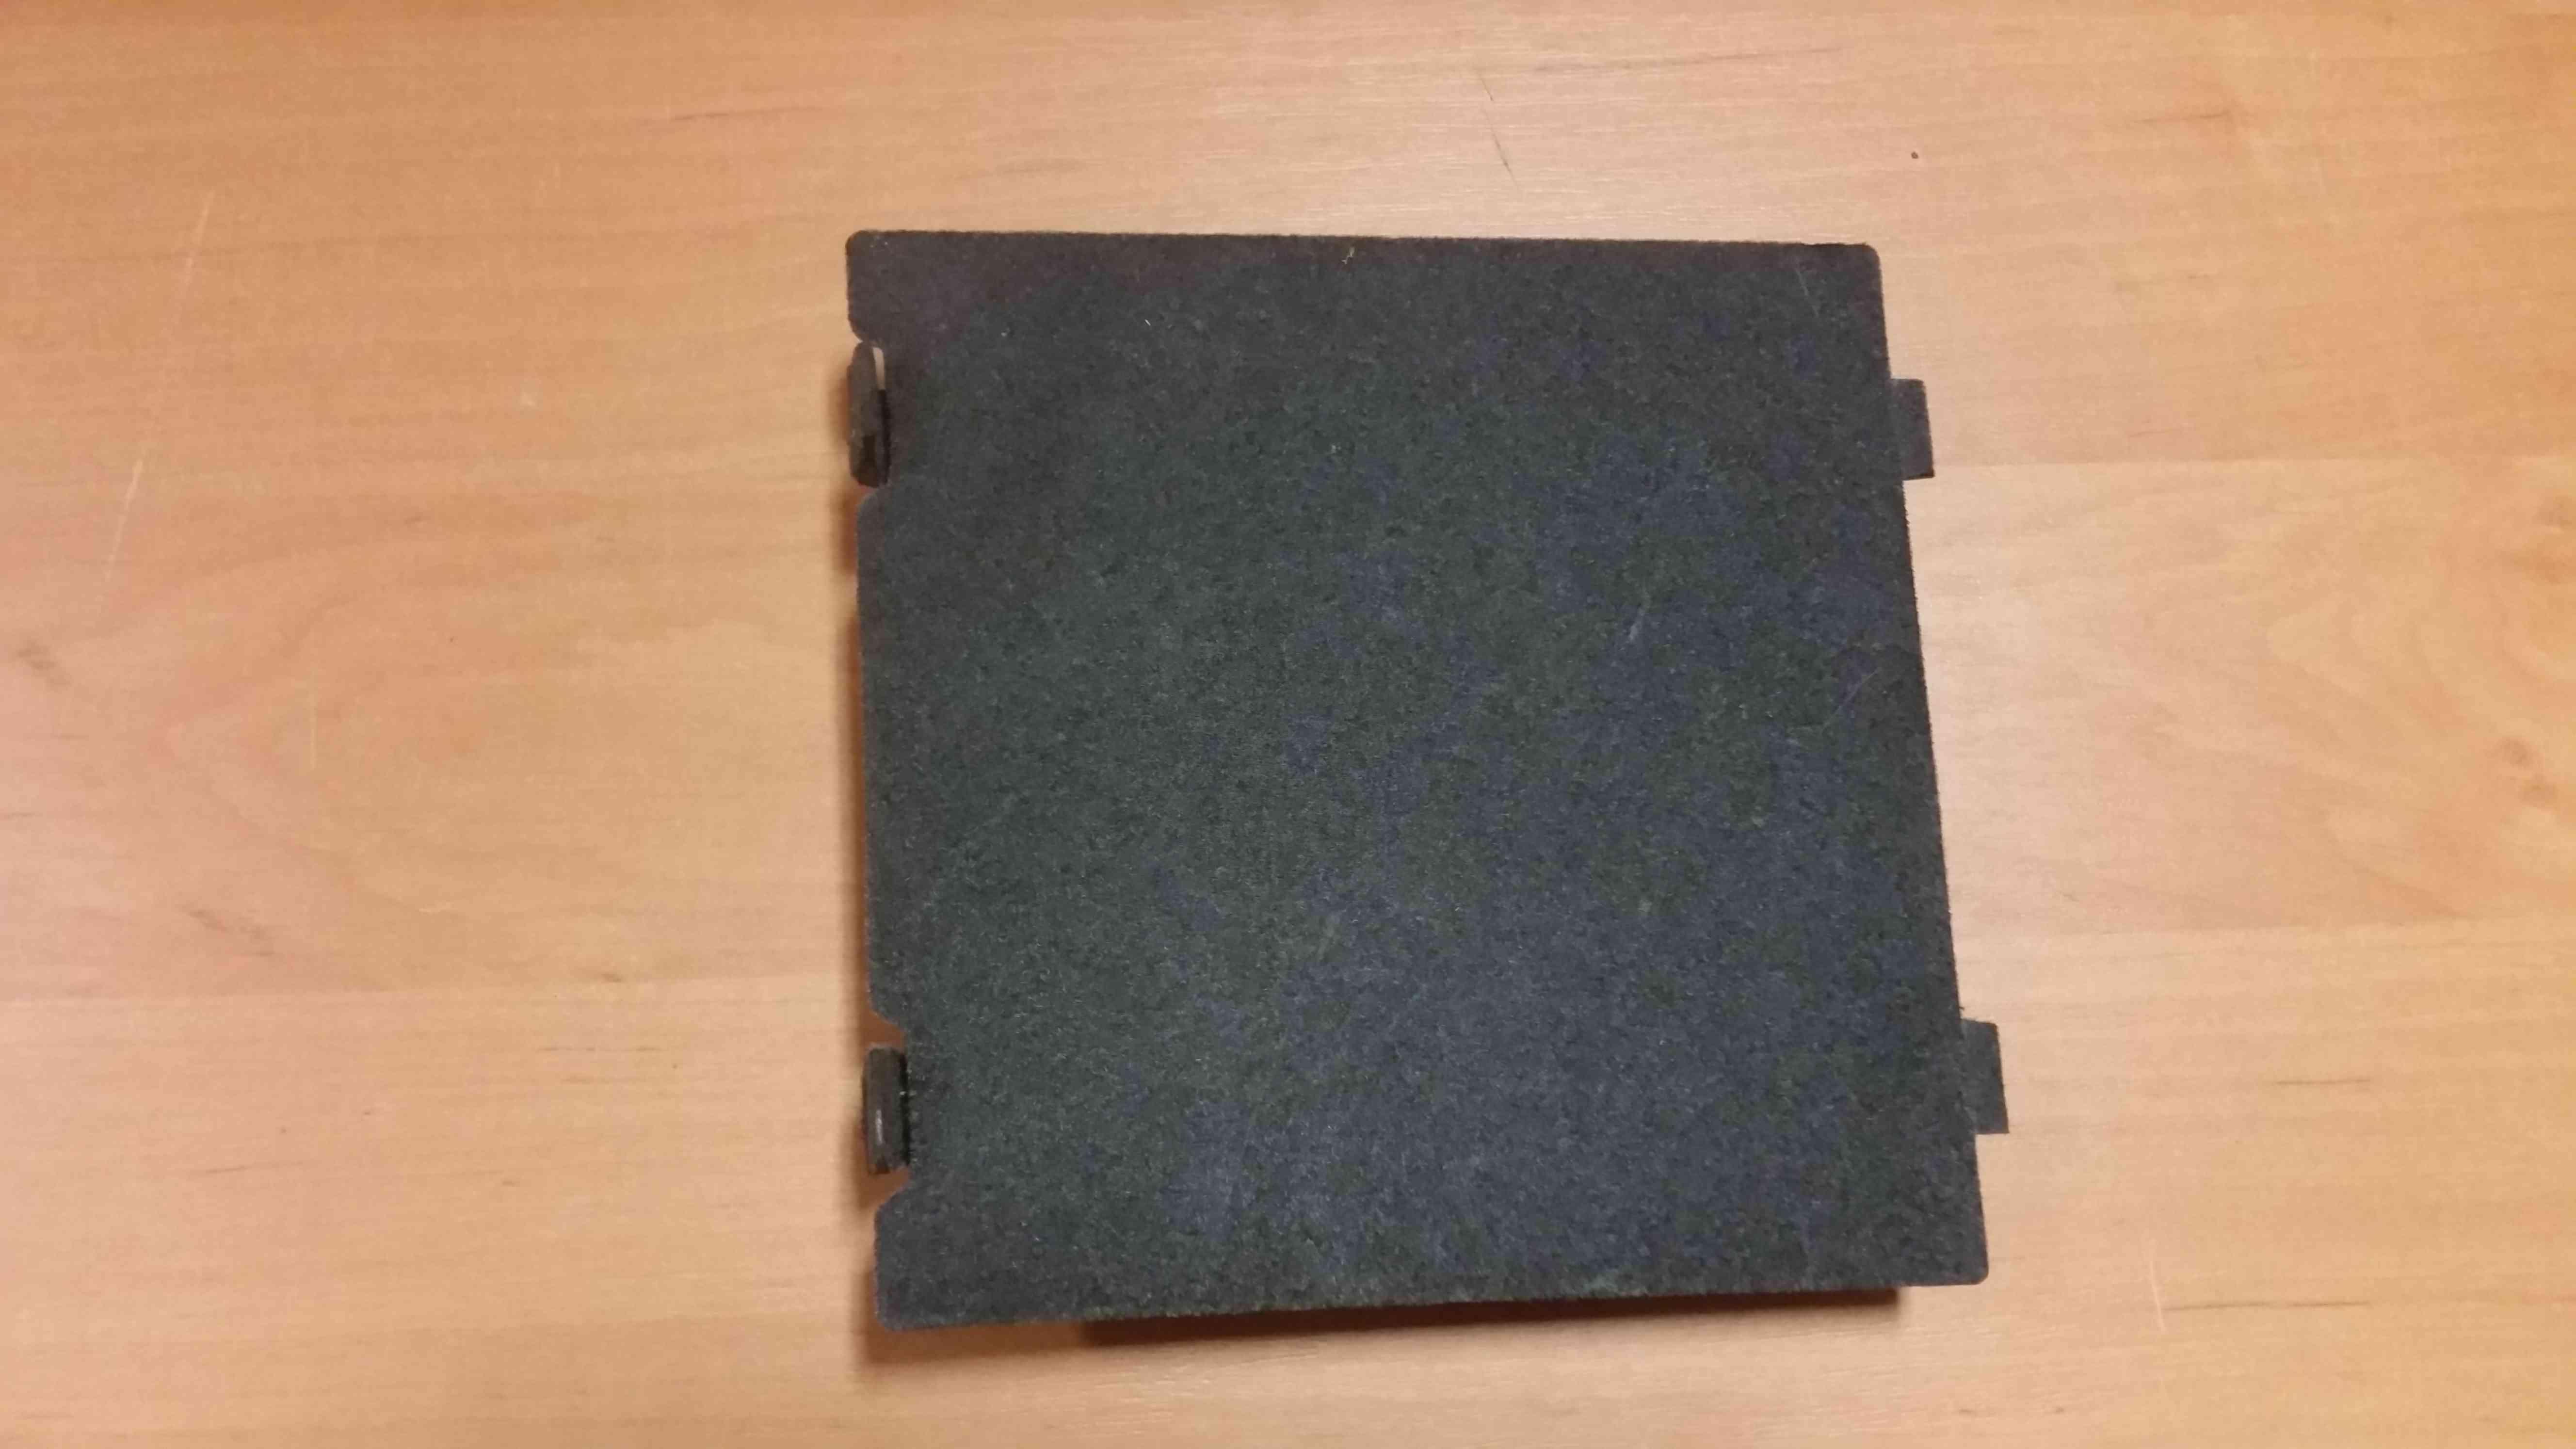 Peugeot 407 Rhd Glove Box Fuse Holder Trim 9647987677 Article